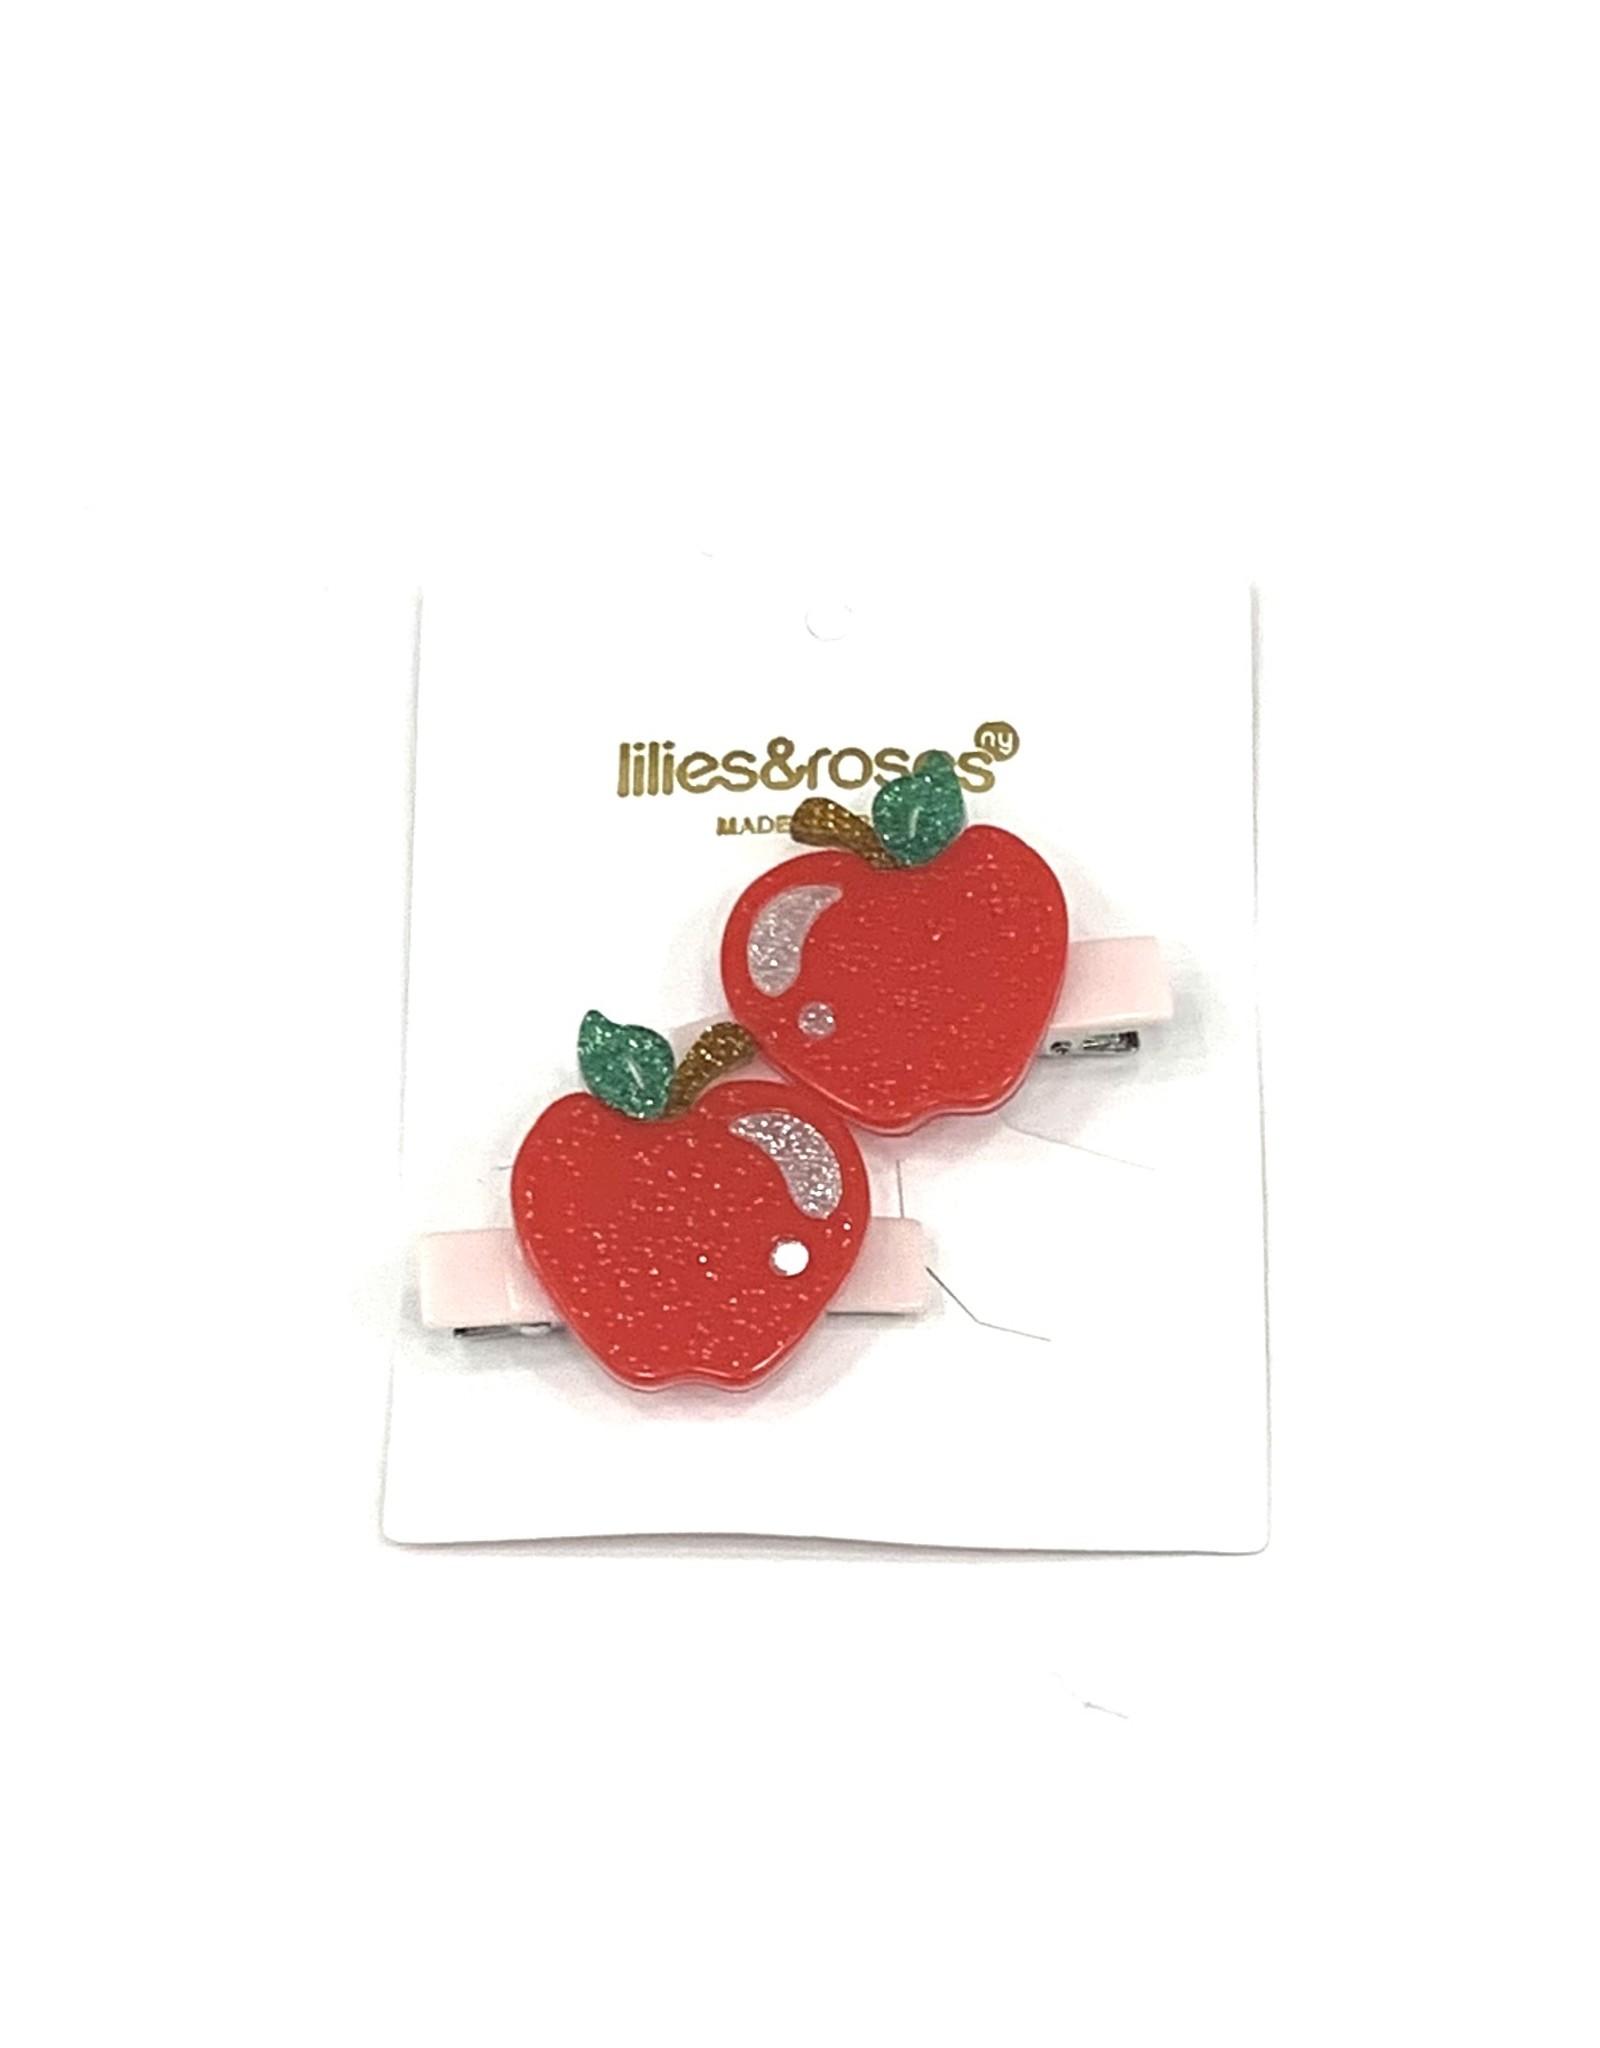 Lillies&Roses Glitter Apple Alligator Clip